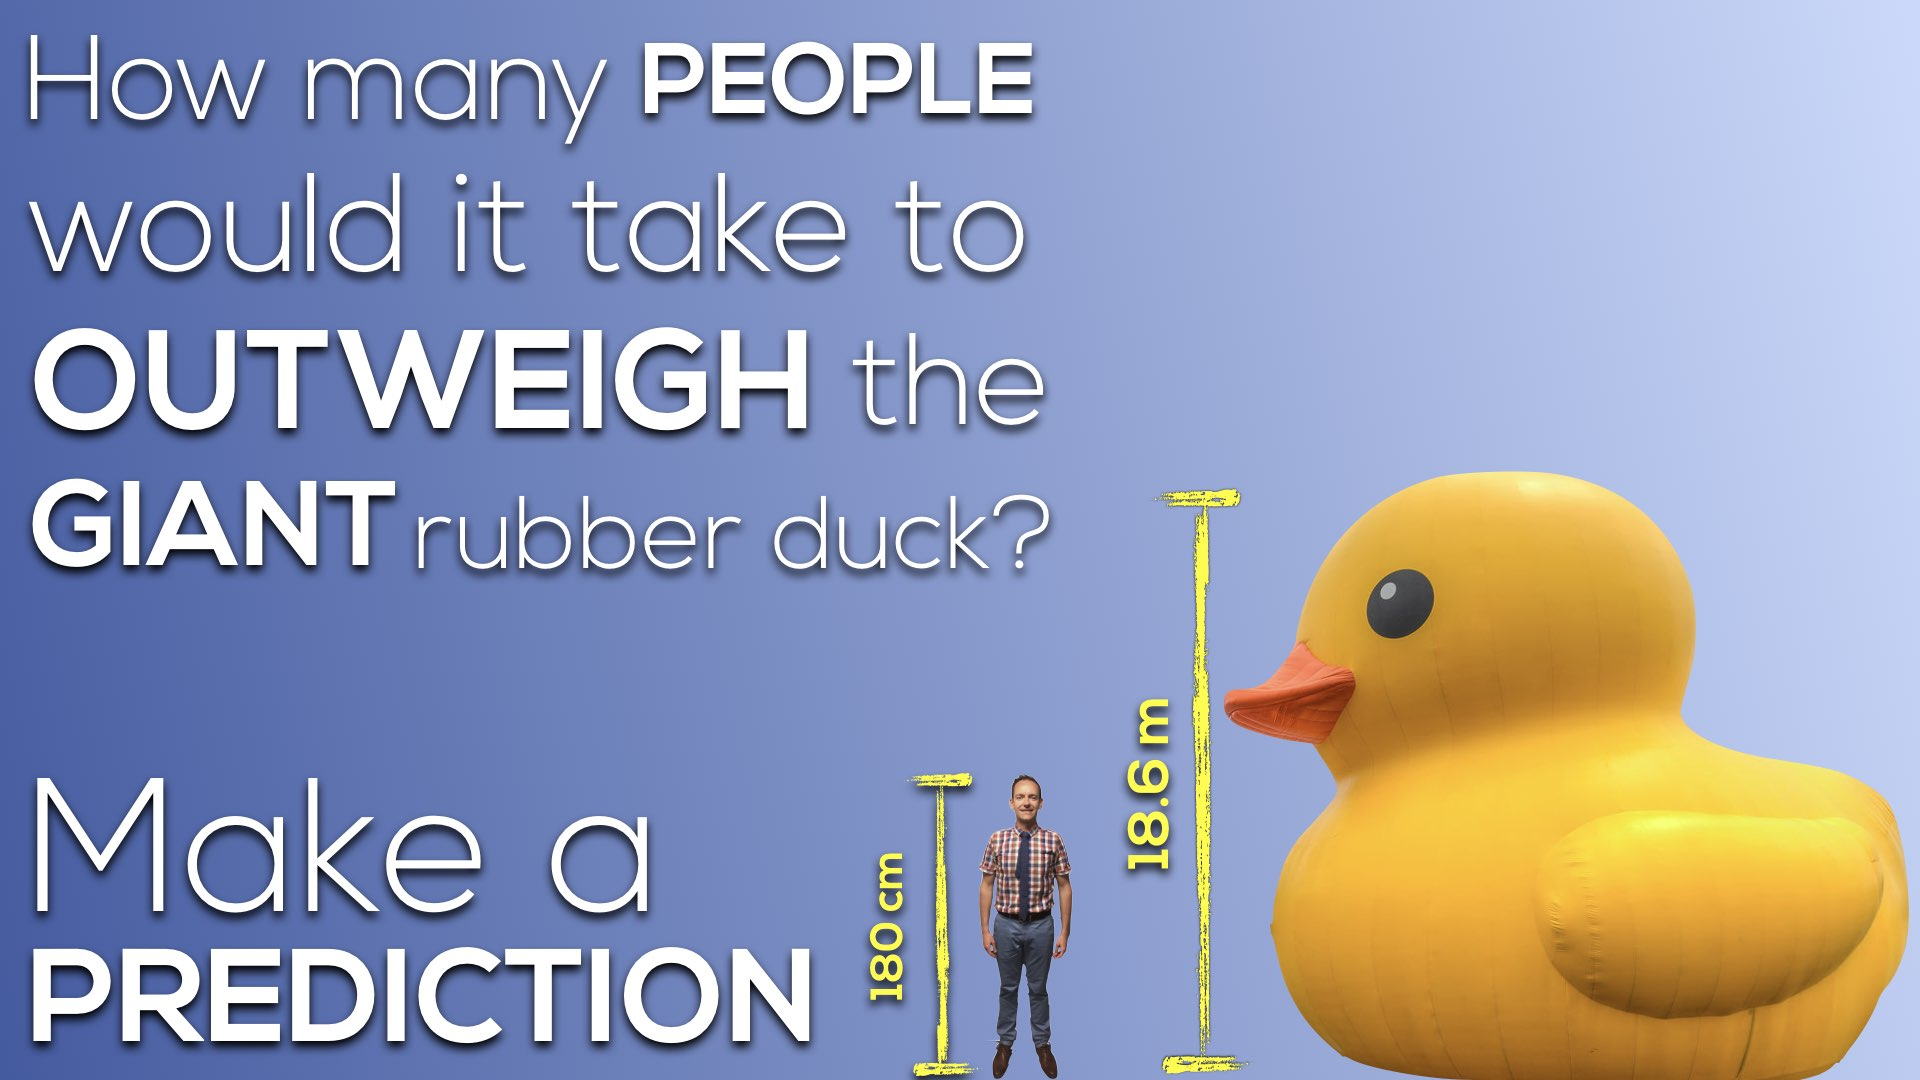 giant rubber duck vs cn tower 3 act math canada150math